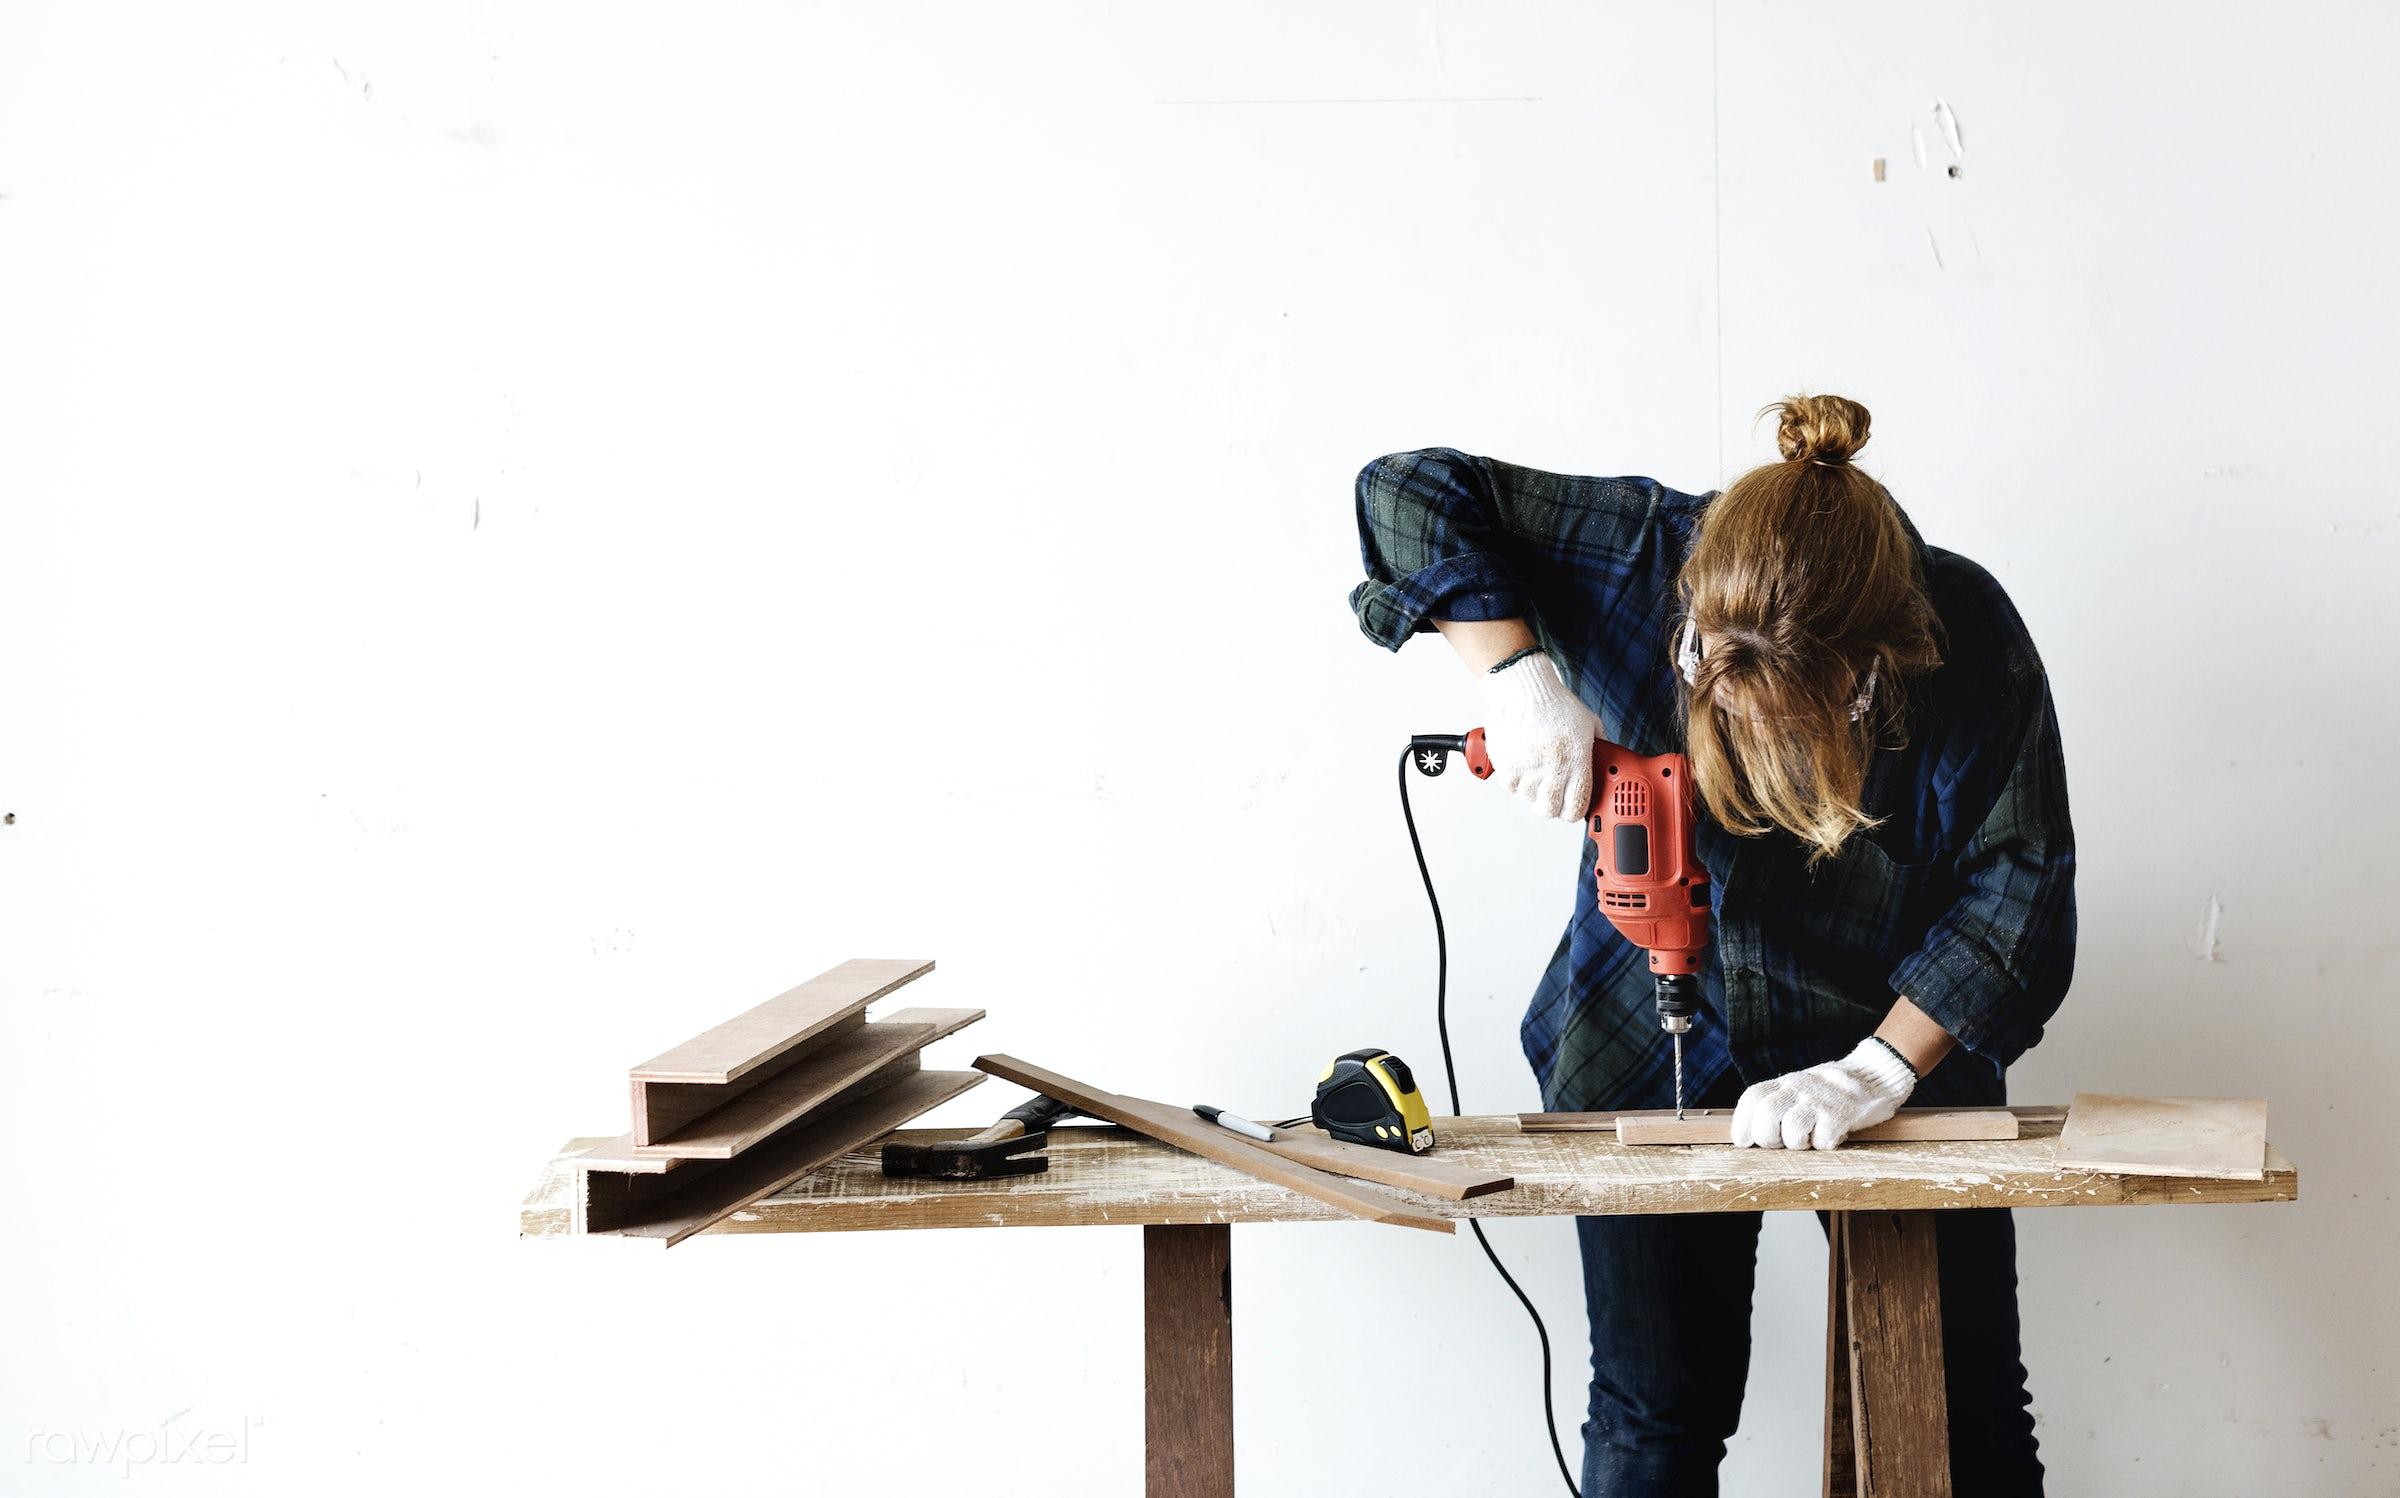 craft, wood, carpentry, tool, plank, equipment, diy, carpenter, woman, handyman, craftsman, worker, drill, repair, industry...